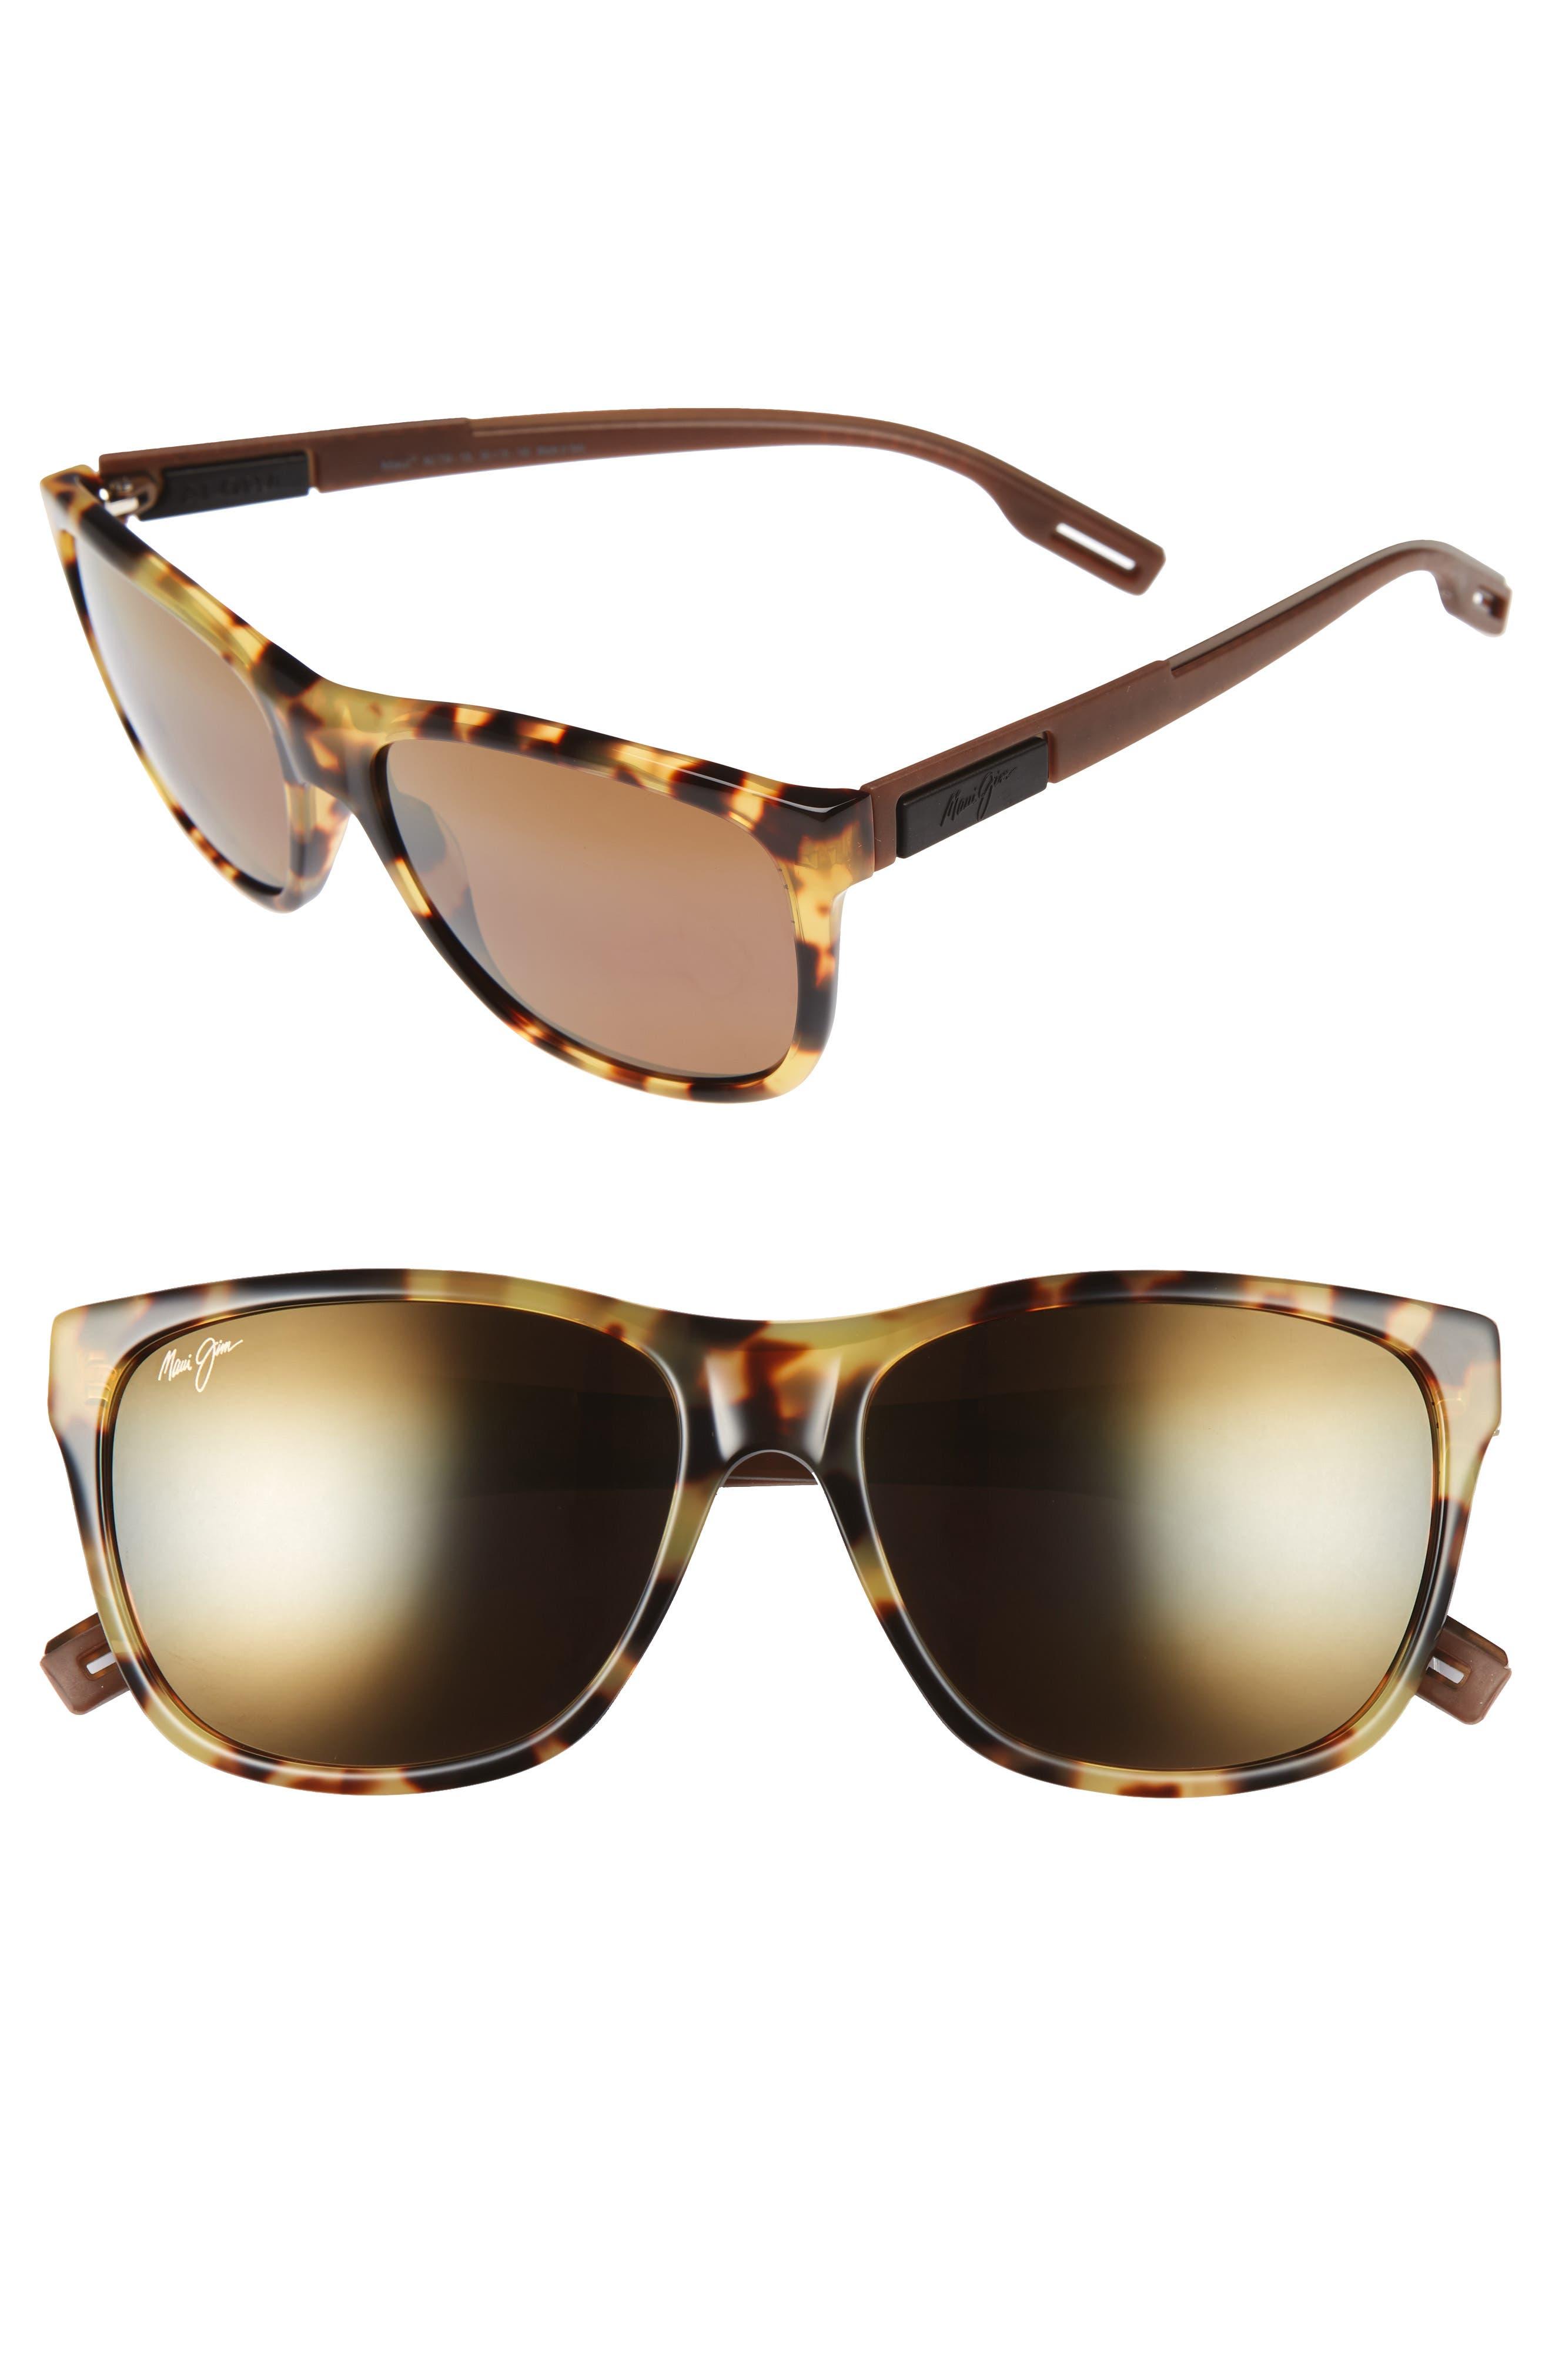 Maui Jim Howzit 56mm Polarized Gradient Sunglasses